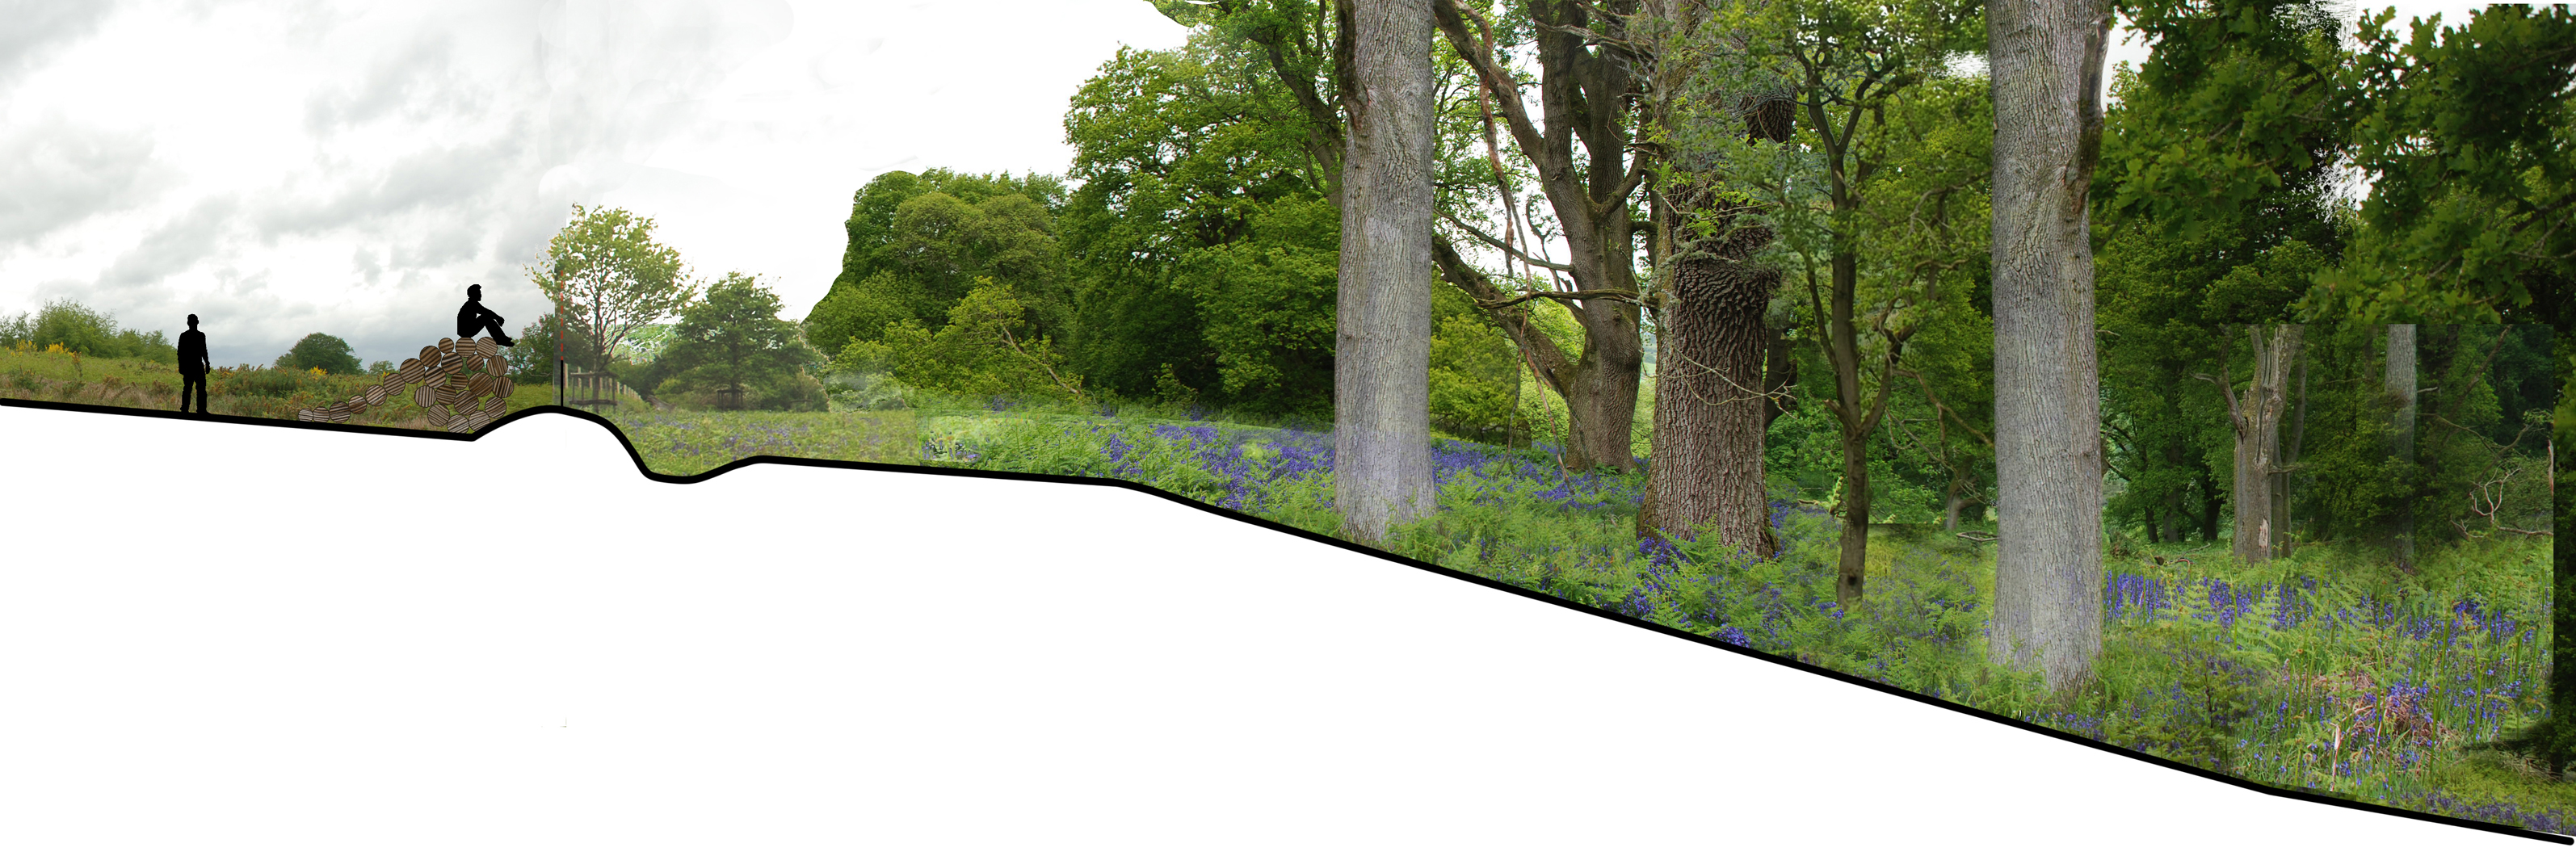 Colvin moggridge news for Female landscape architects